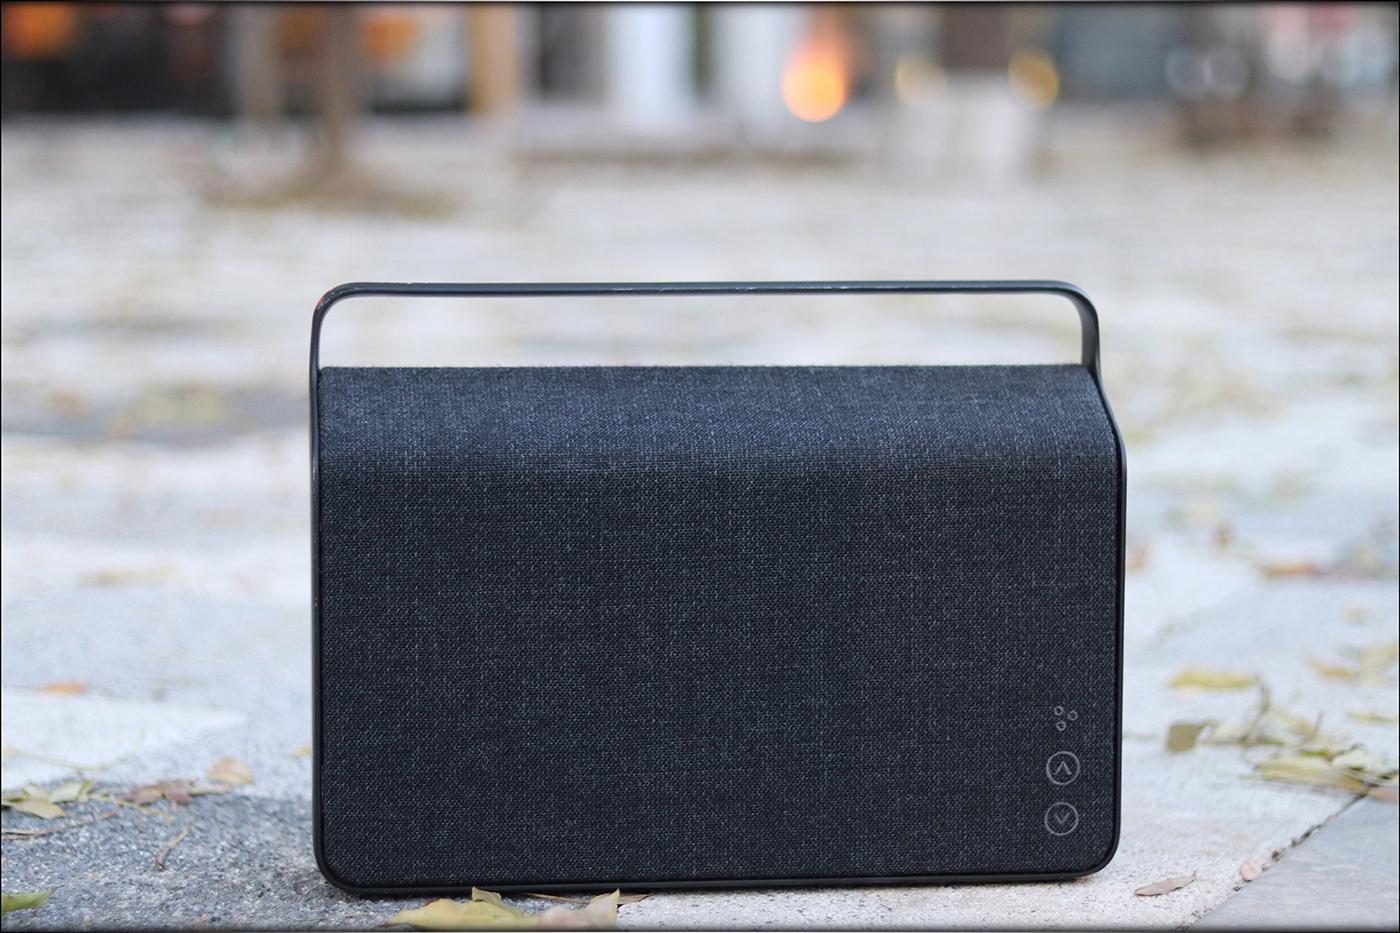 Vifa-Copenhagen-Stereo-Bluetooth-Speaker-APT-X-Airplay-Wireless-AUX-In-Depth-Review-Audiophile...jpg